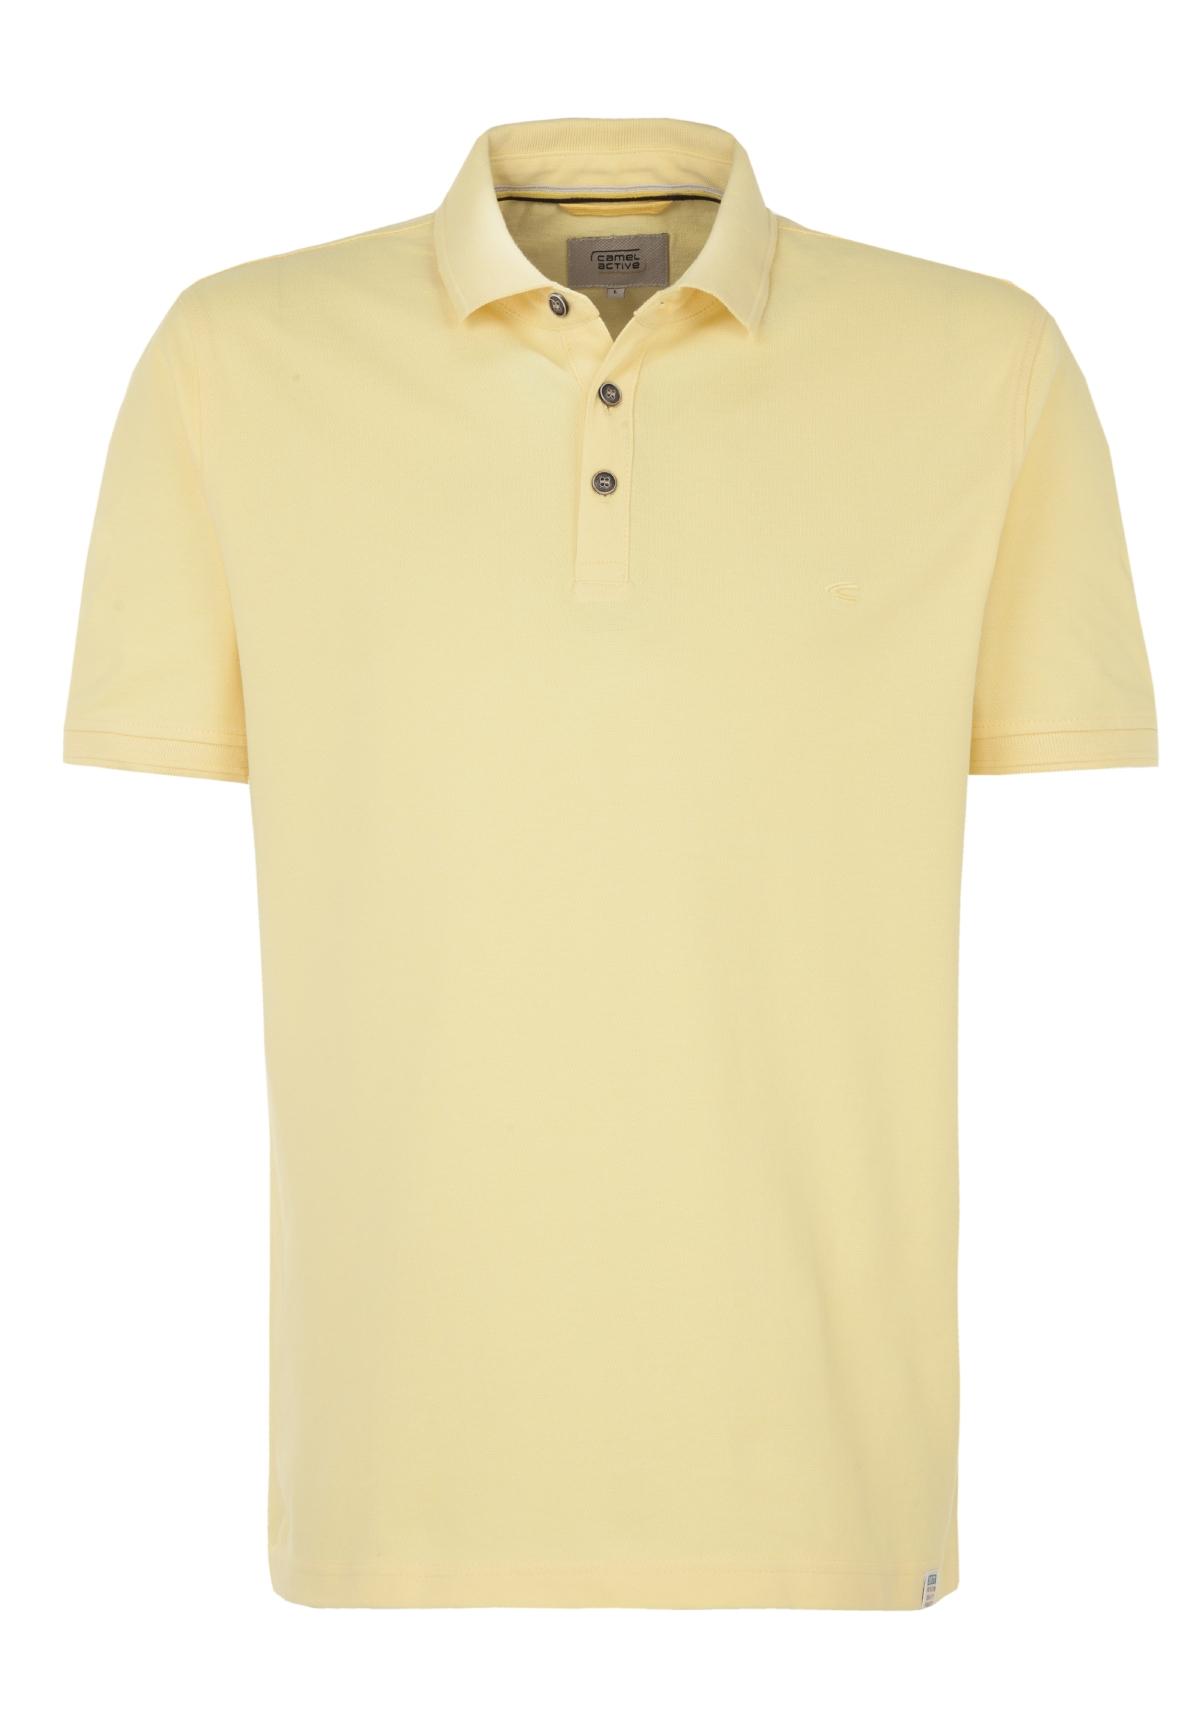 Camel-Active-Herren-Shirt-Poloshirt-Pique-Regular-Fit-NEU Indexbild 67